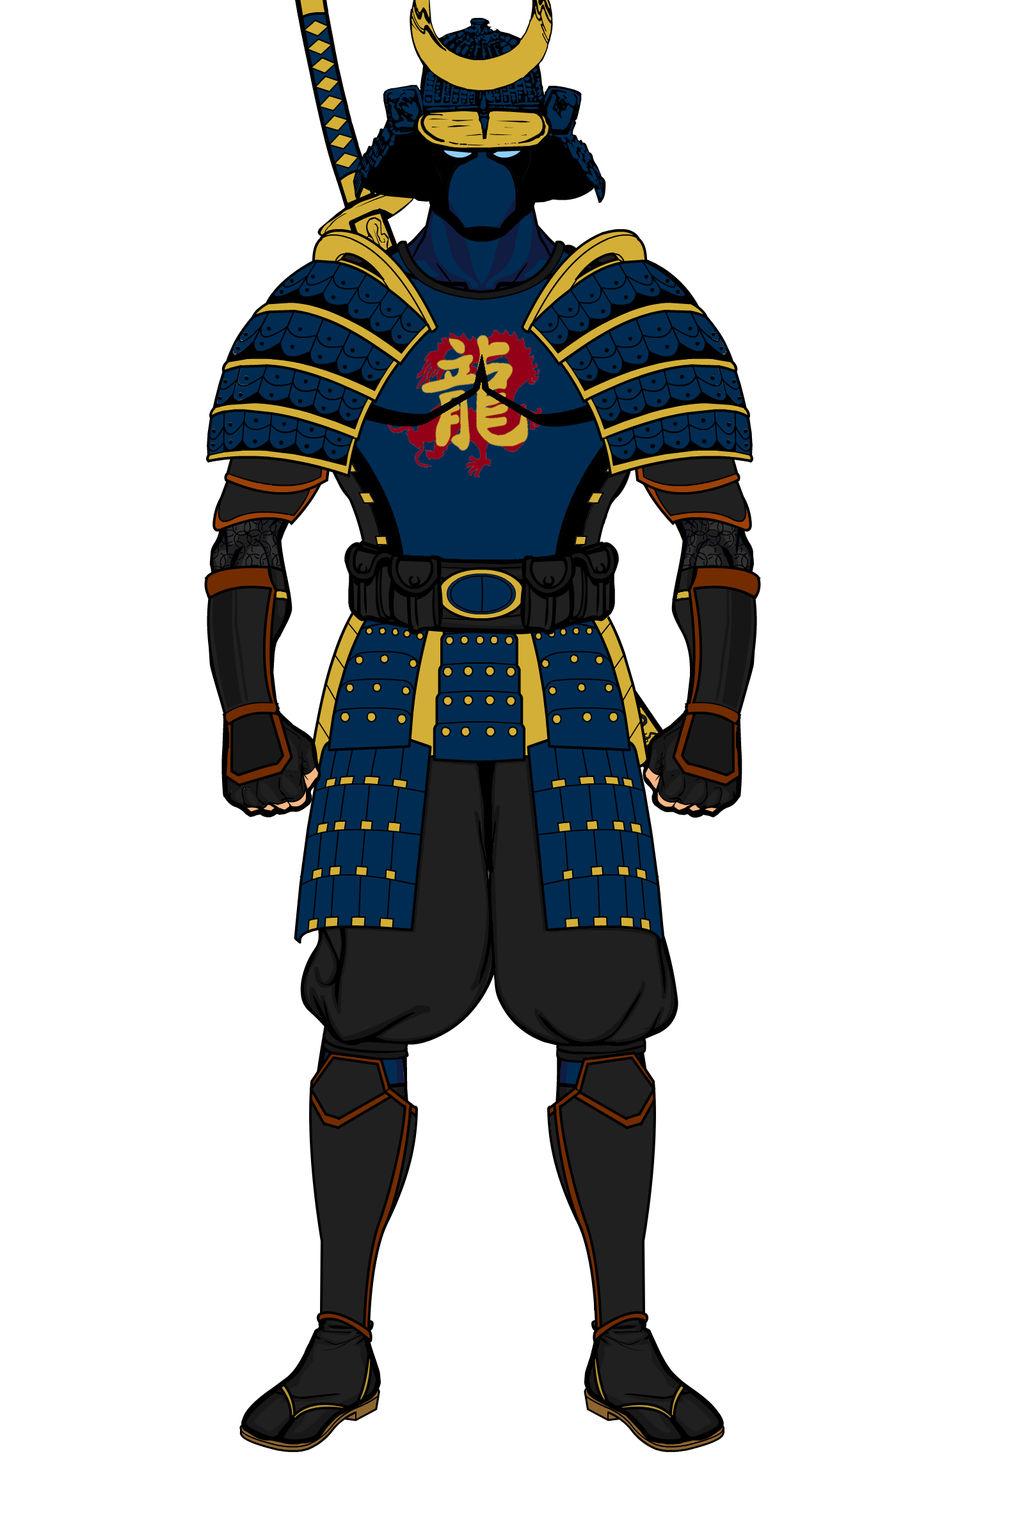 Kataman Comic Dragon Ninja Shogun Armor By Aniartluke82 On Deviantart Acts as a normal shield attack. kataman comic dragon ninja shogun